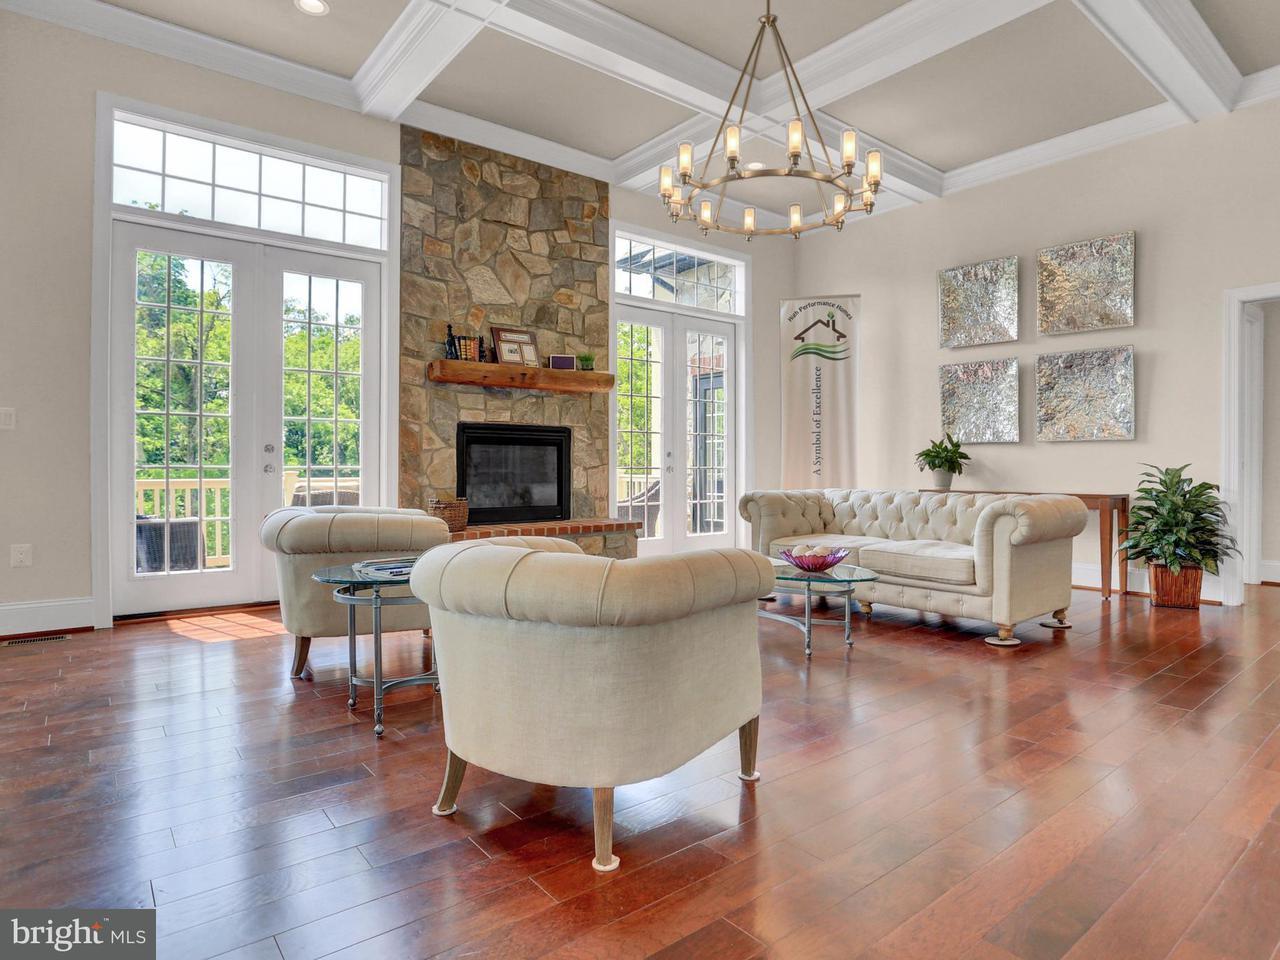 Additional photo for property listing at 2923 Cox Neck Rd E 2923 Cox Neck Rd E Chester, Maryland 21619 Estados Unidos